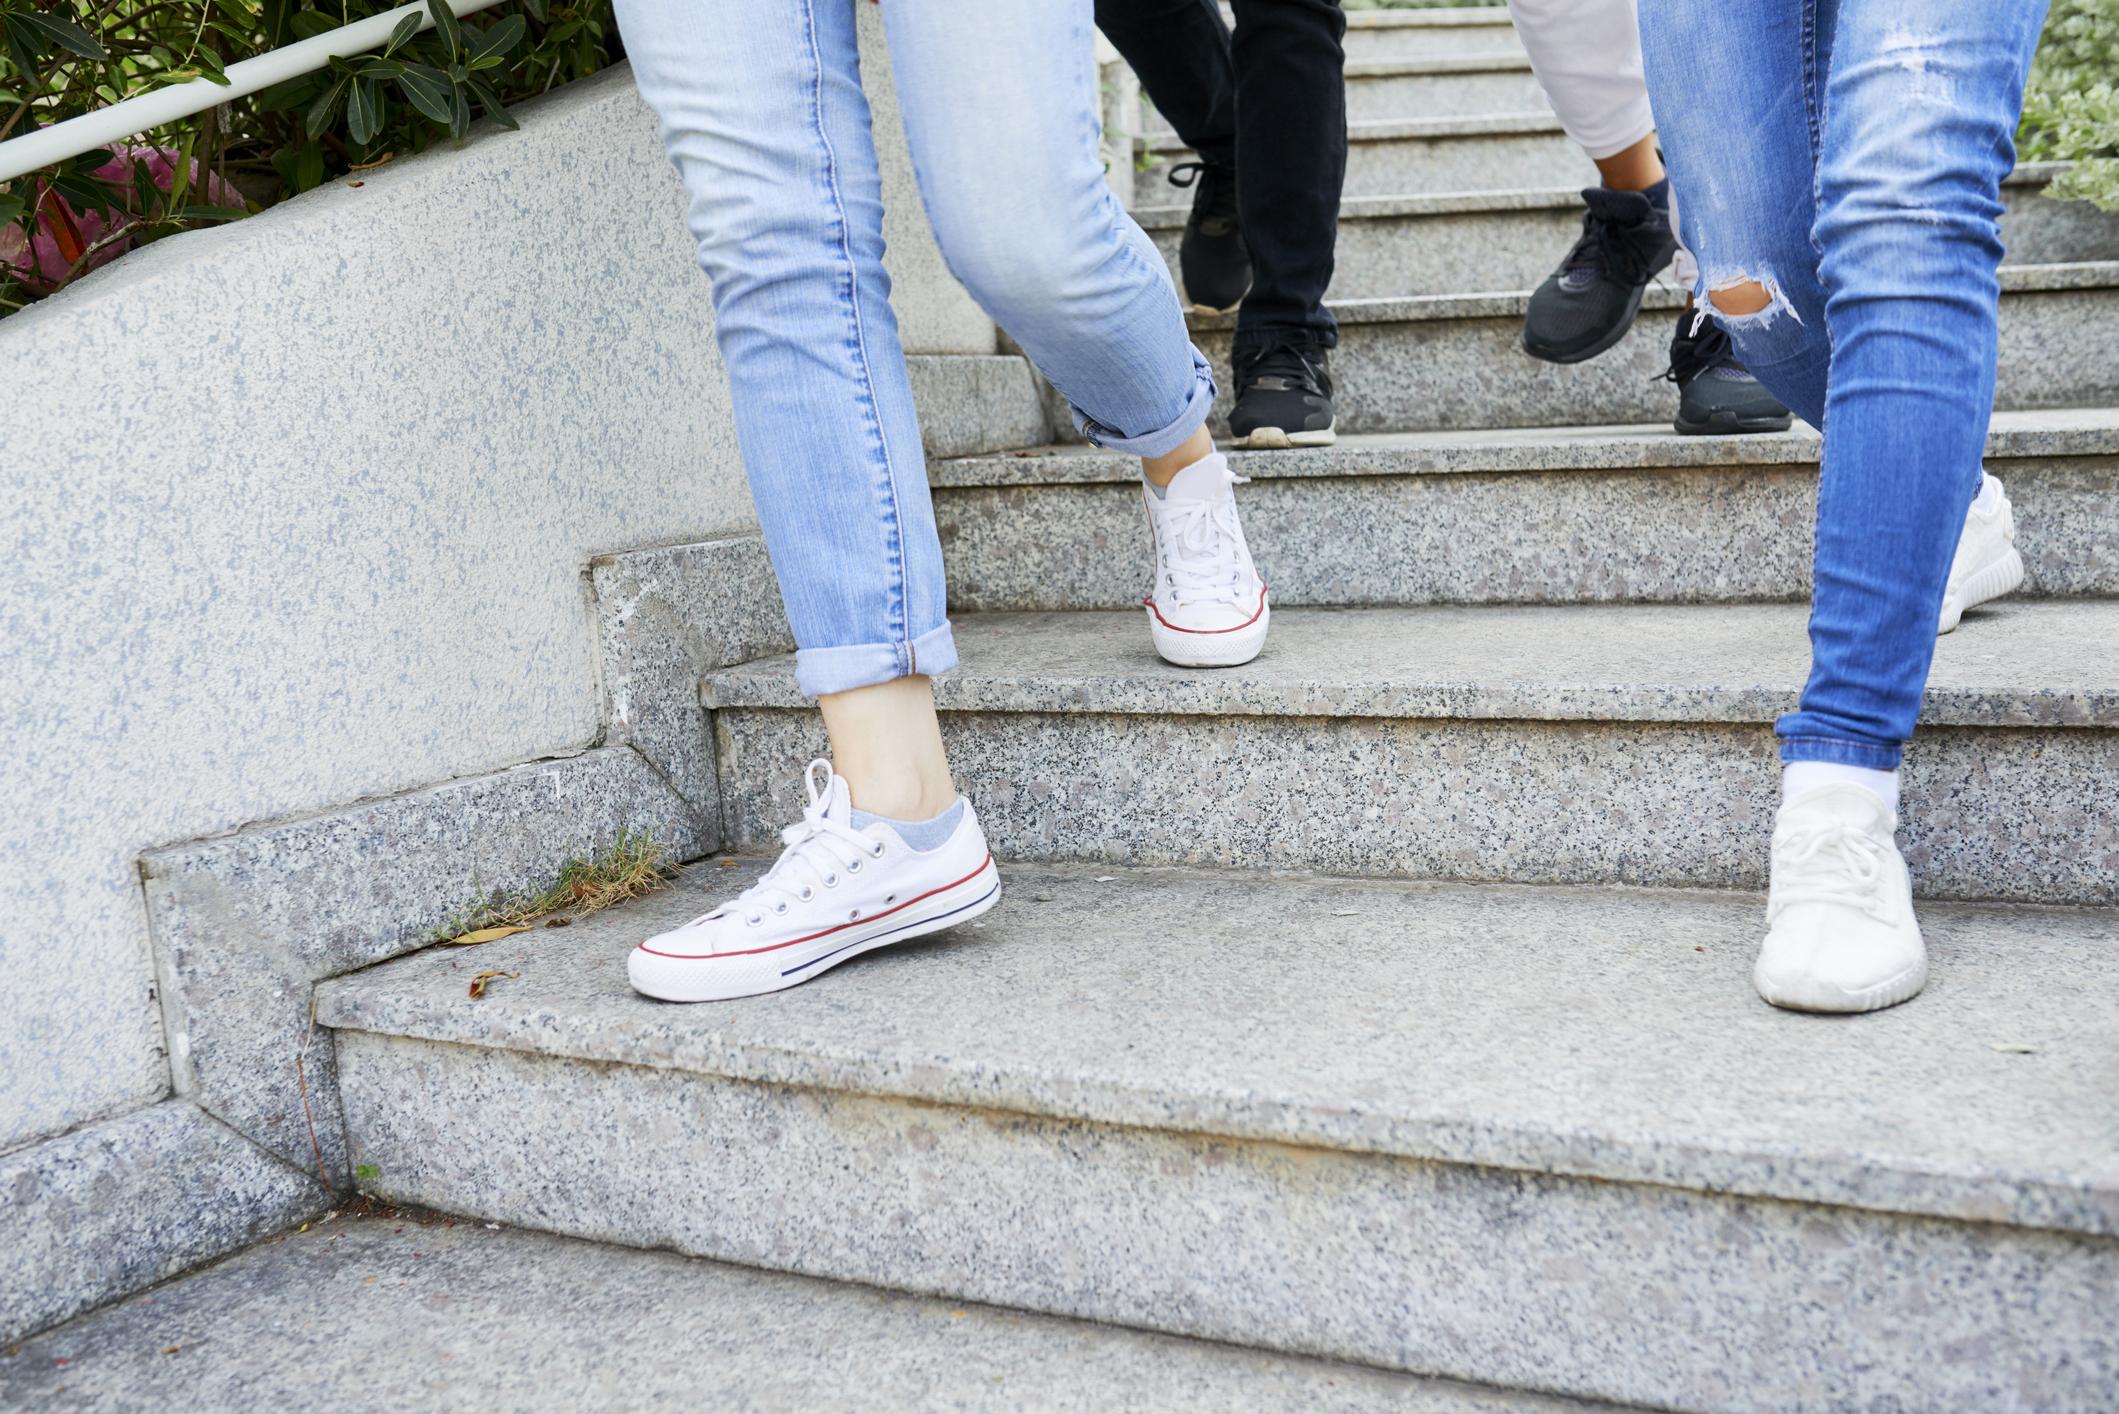 feet of young people walking